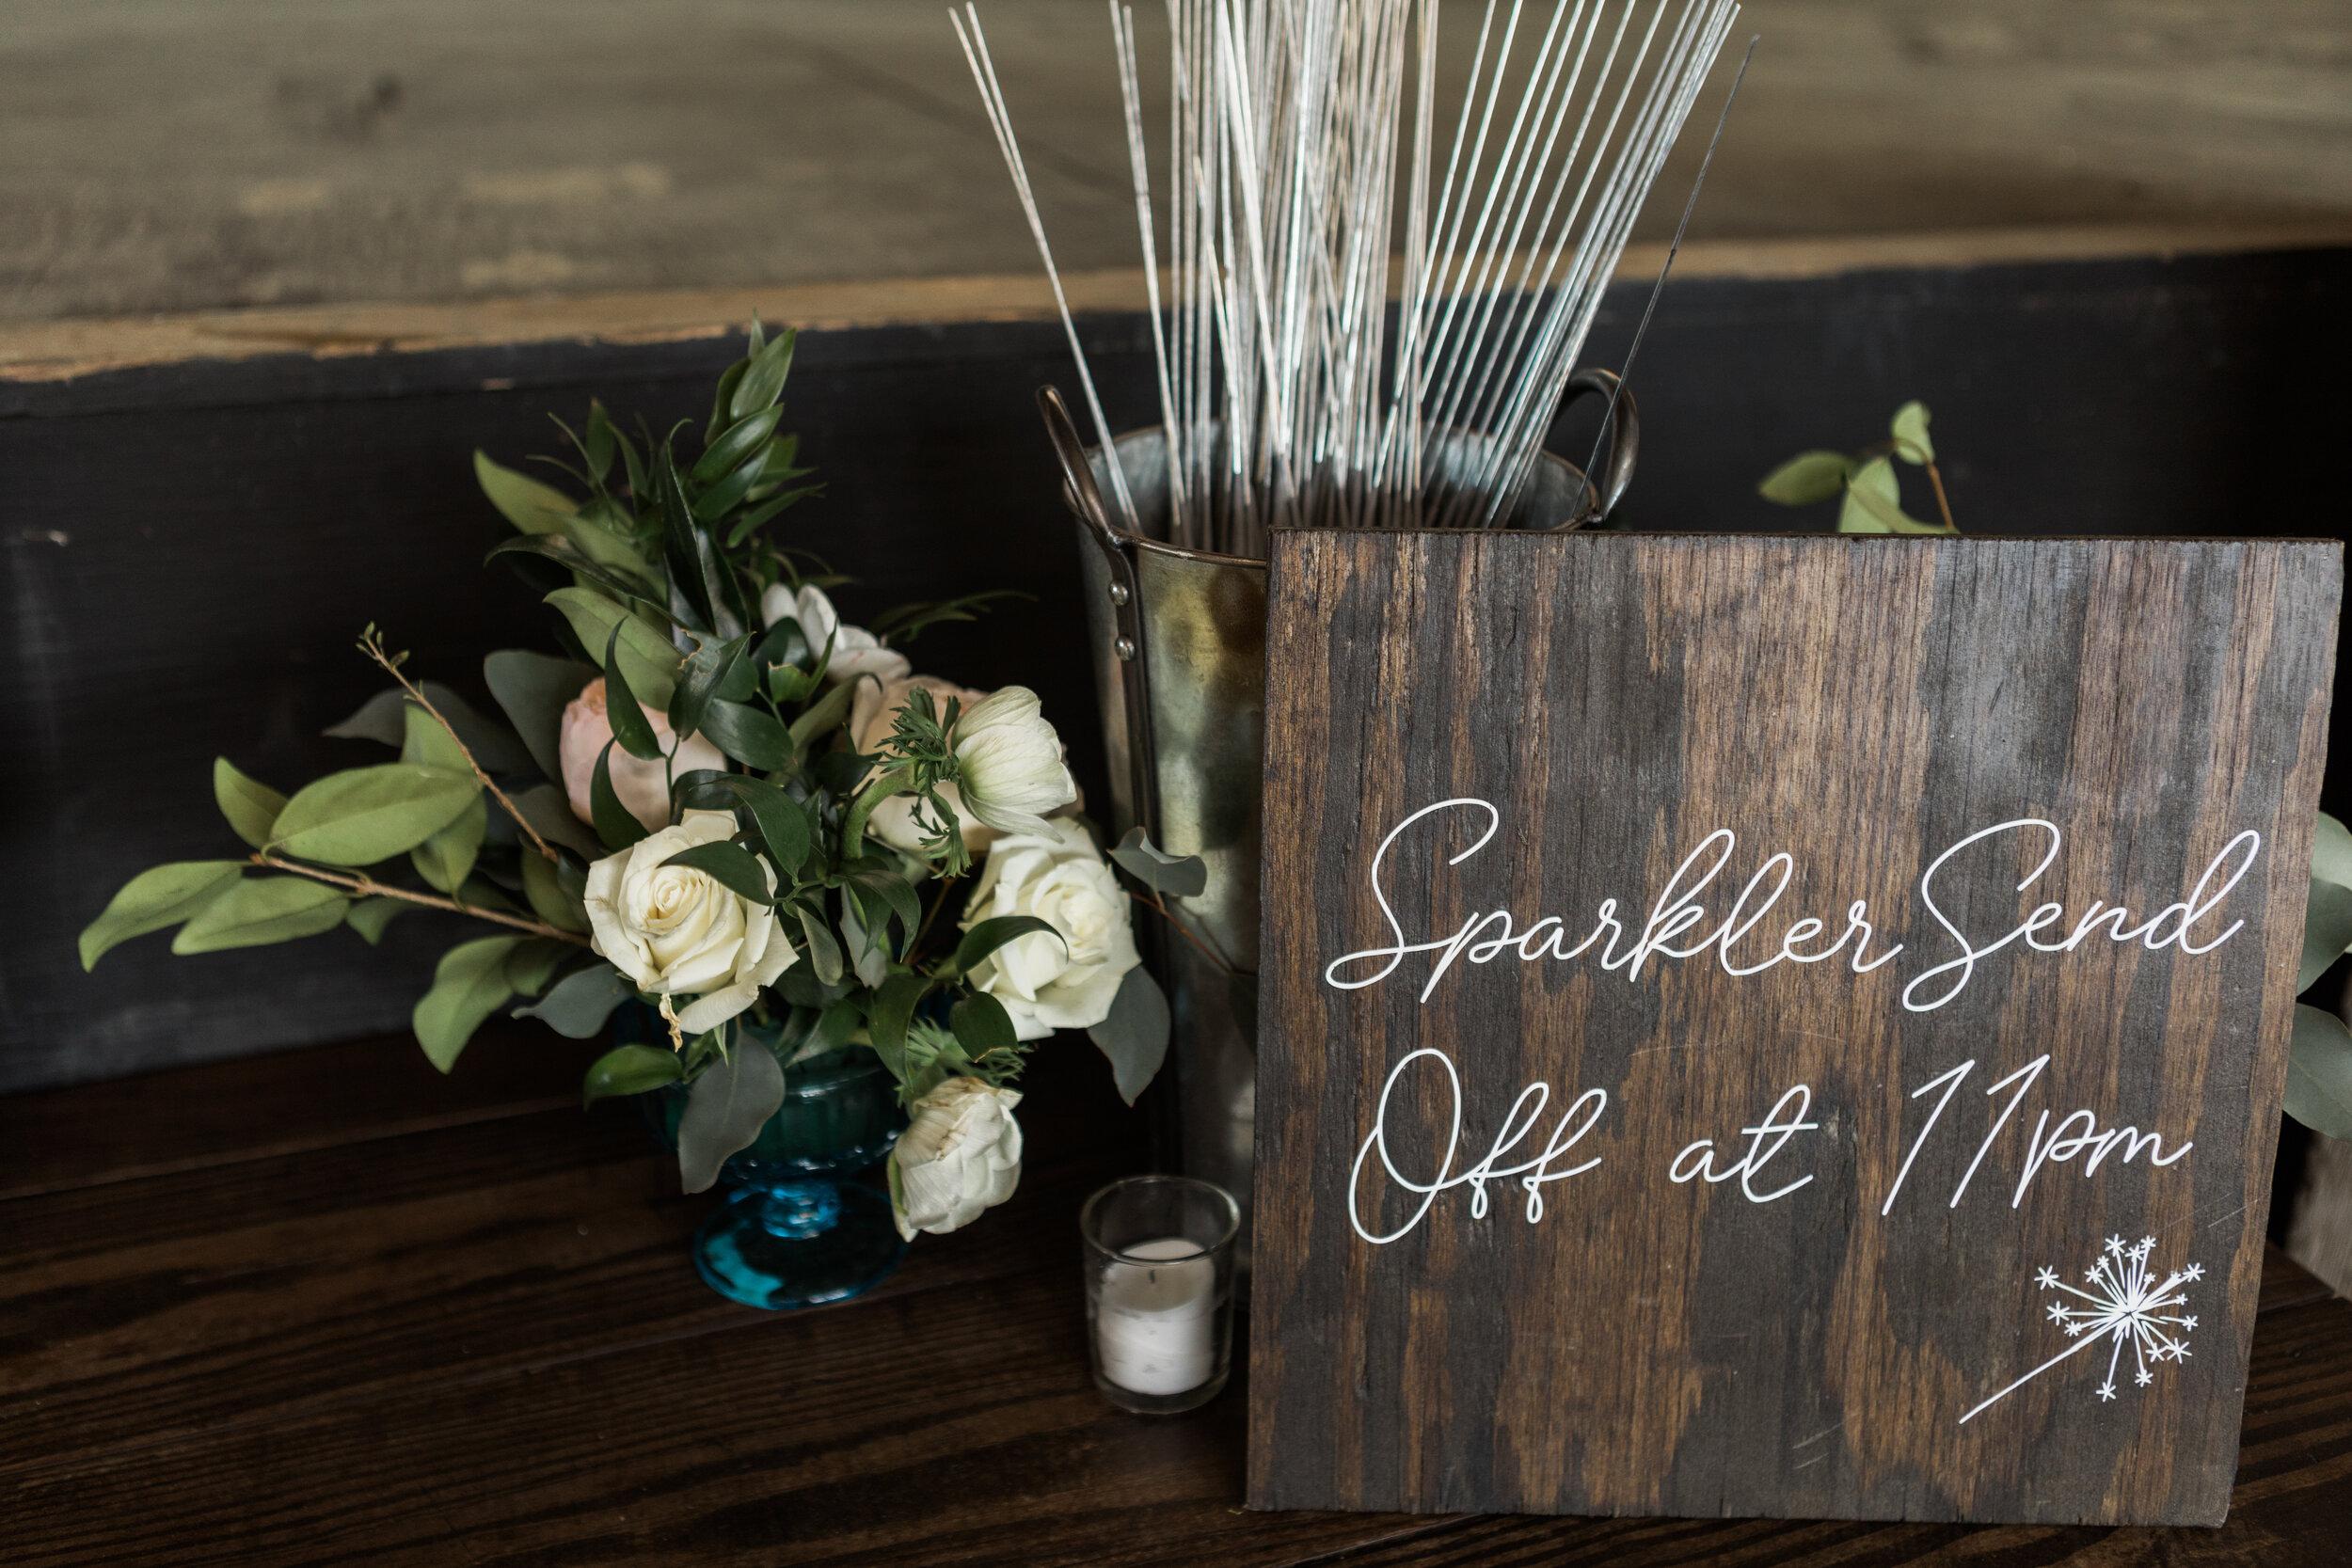 ivory-and-beau-blog-weddings-ivory-and-beau-couple-dominique-and-andres-savannah-florist-wedding-planning-savannah-bridal-boutique-wedding-flowers-KIP_WEBERWEDDING_RAILROADMUSEUM-1145.JPG